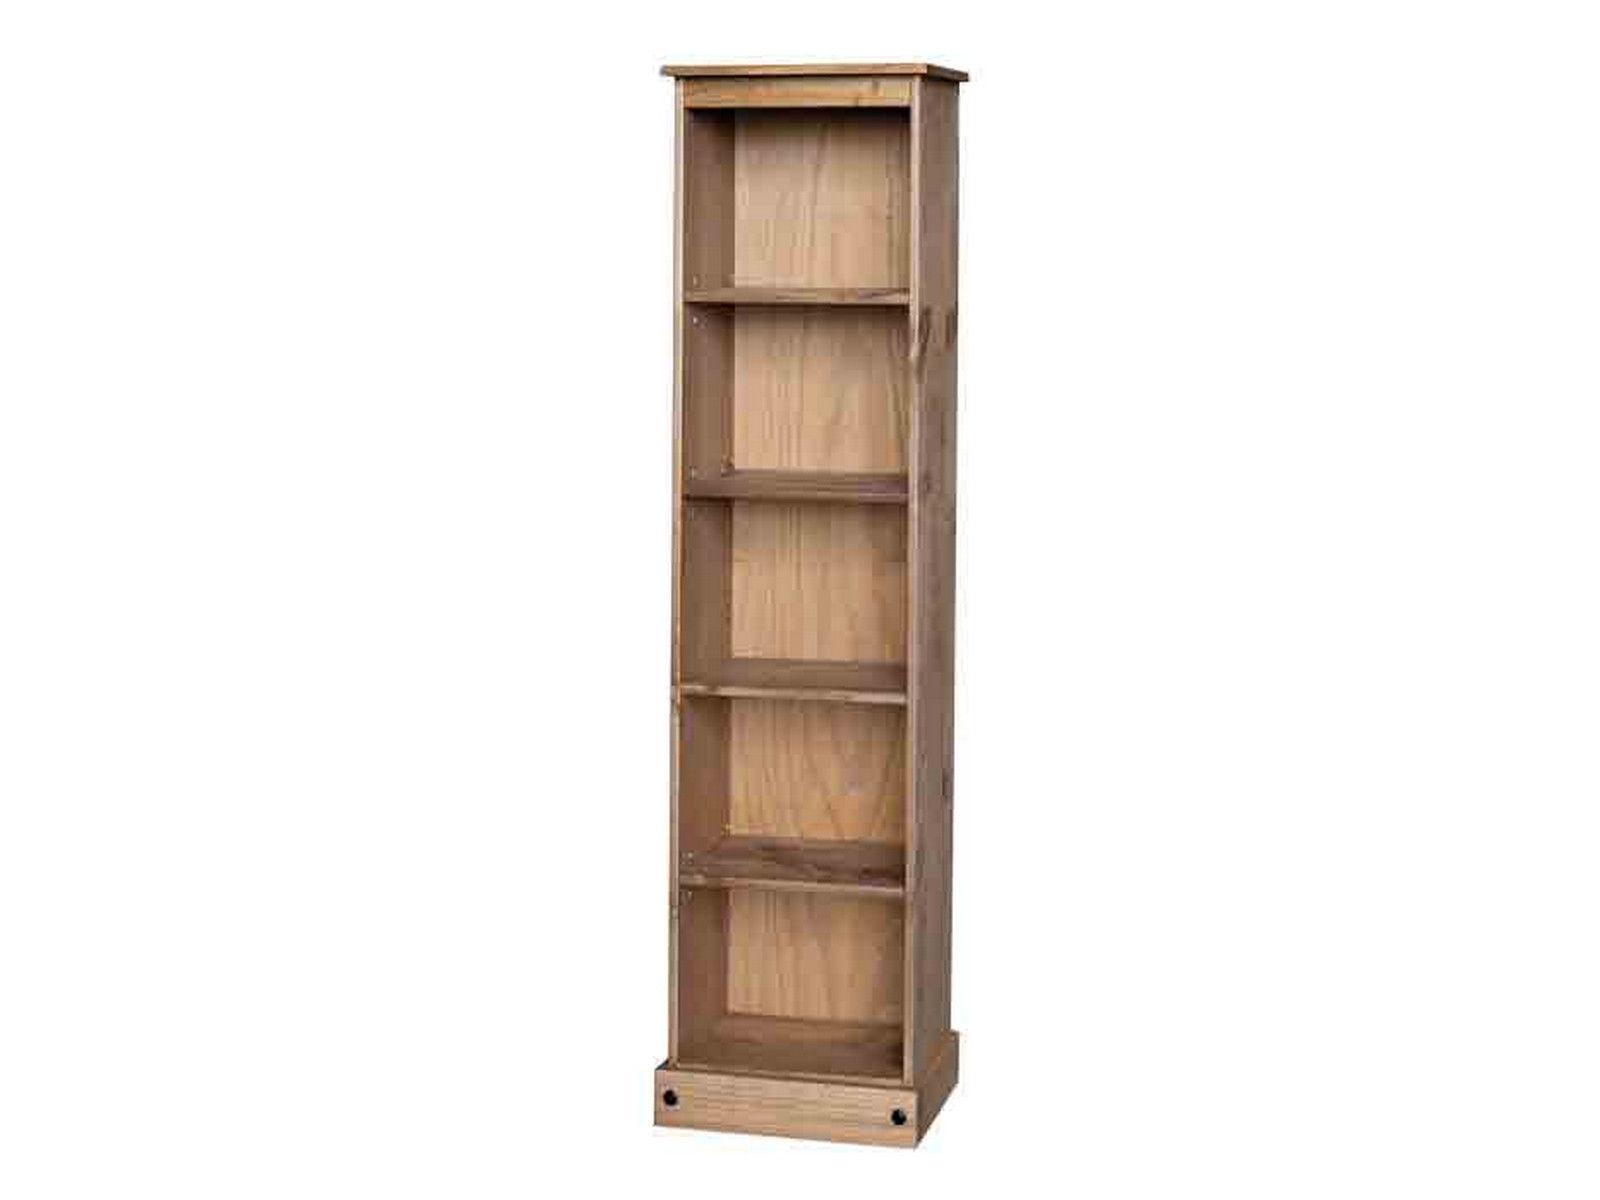 Premium Quality Corona Tall Narrow Bookcase Display